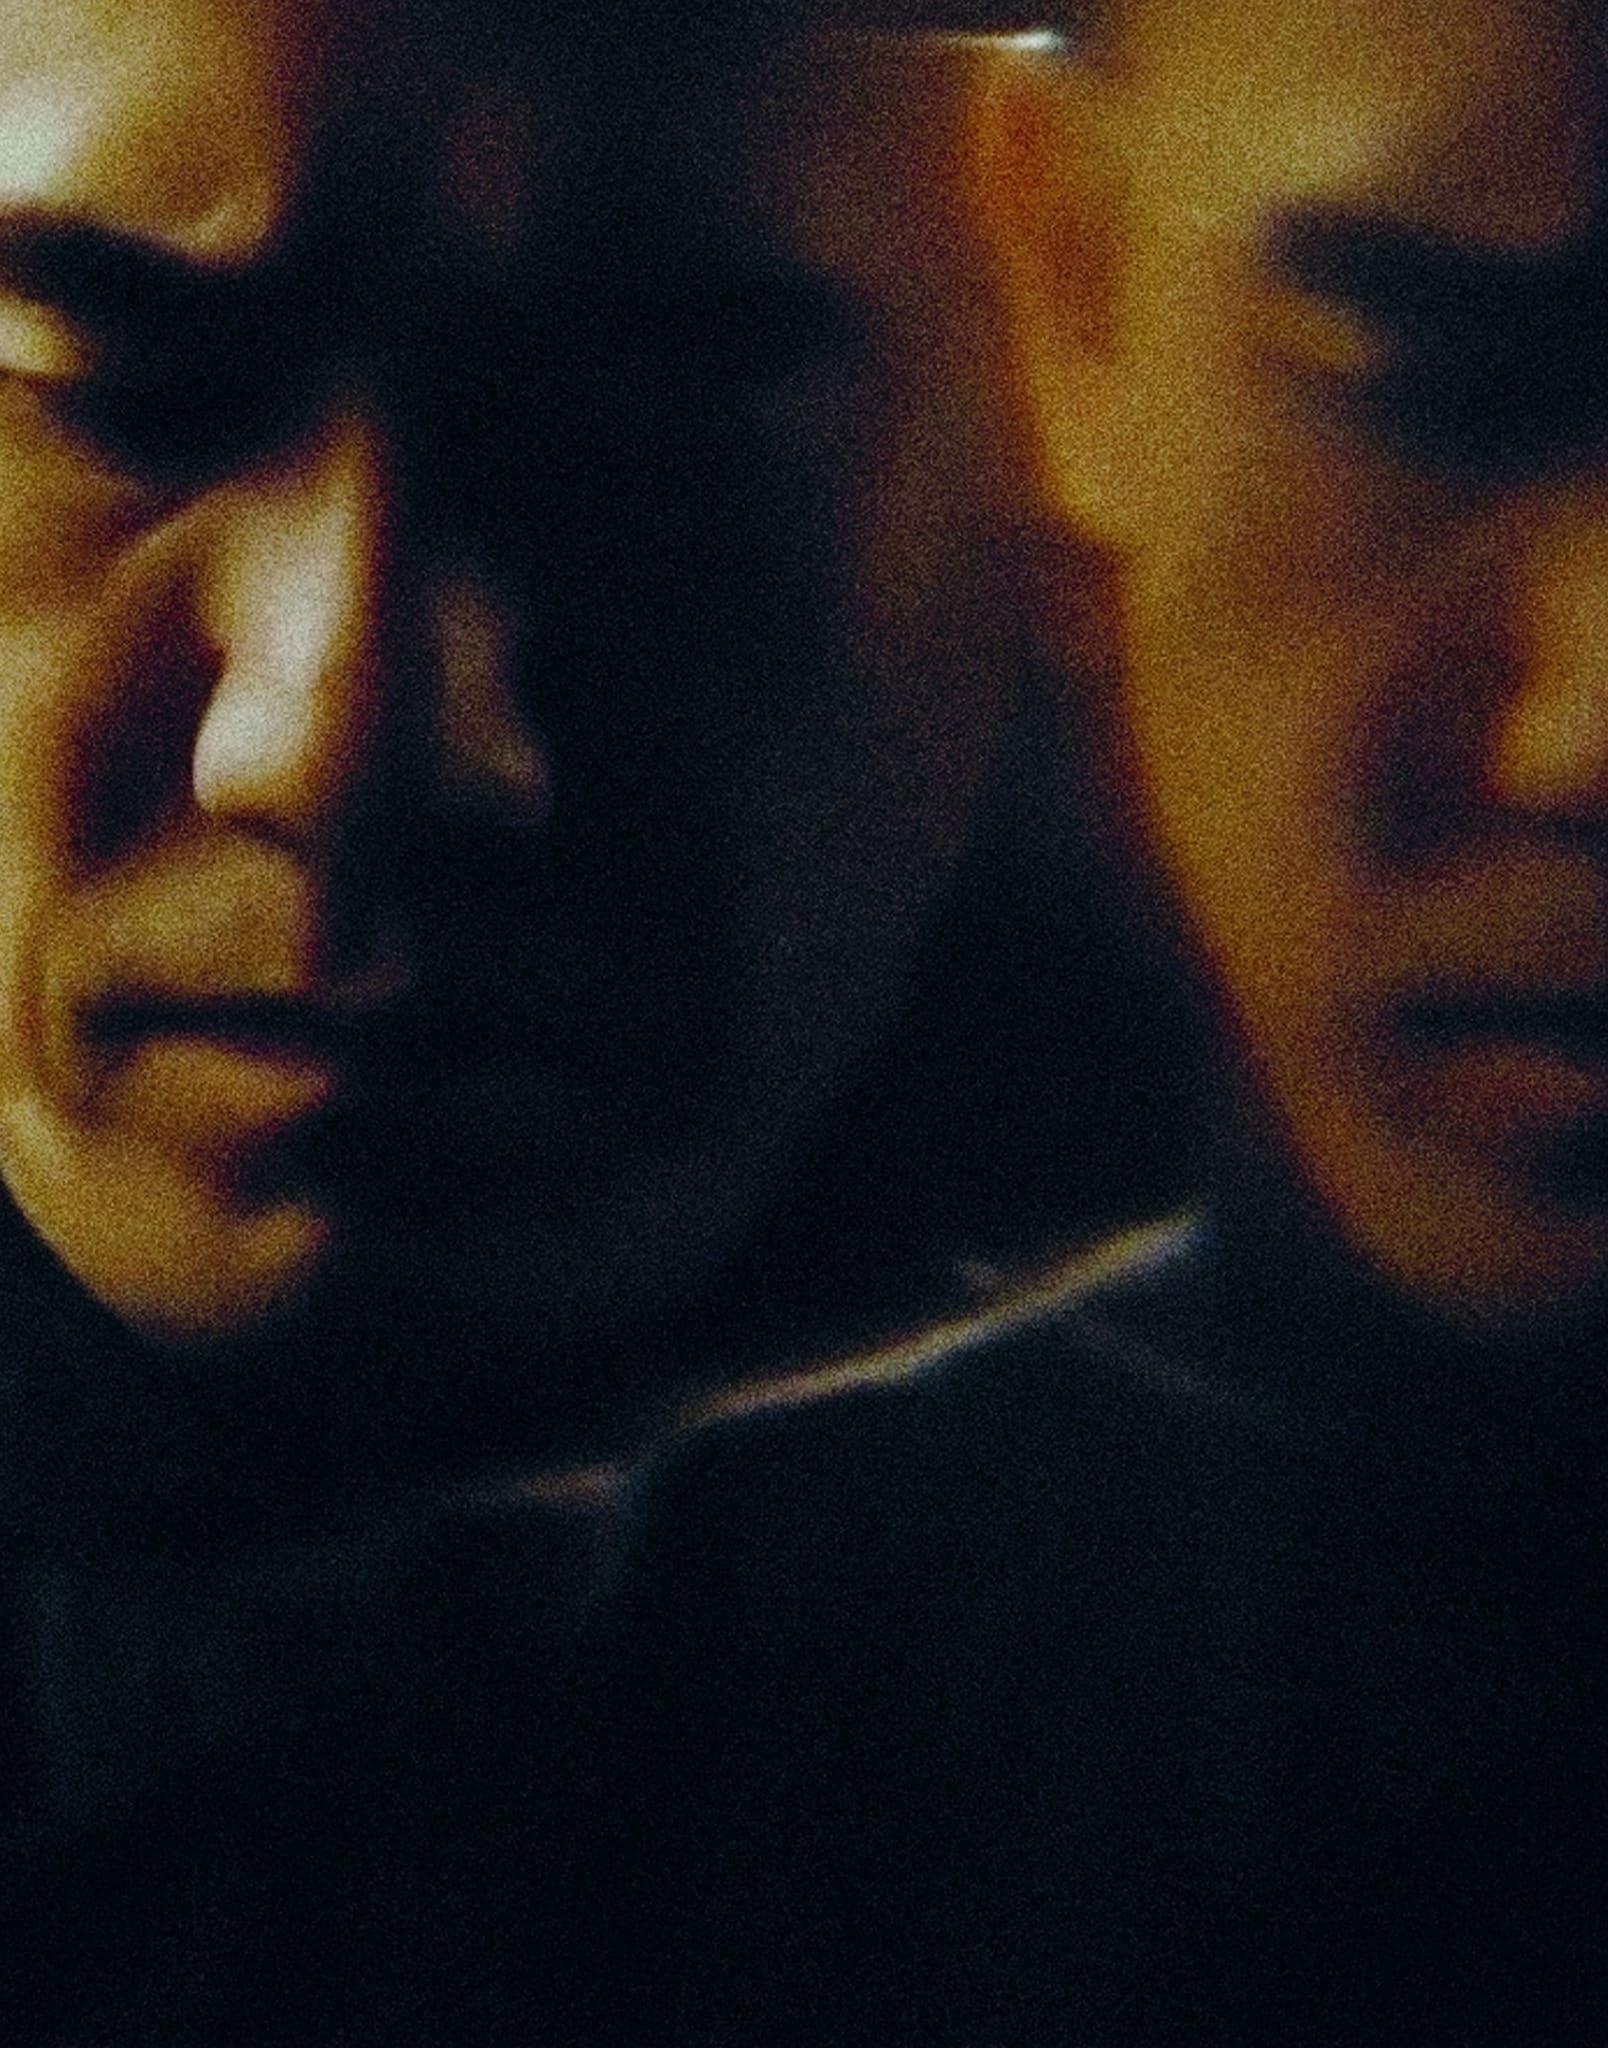 The Nameless by Ho Tzu Nyen